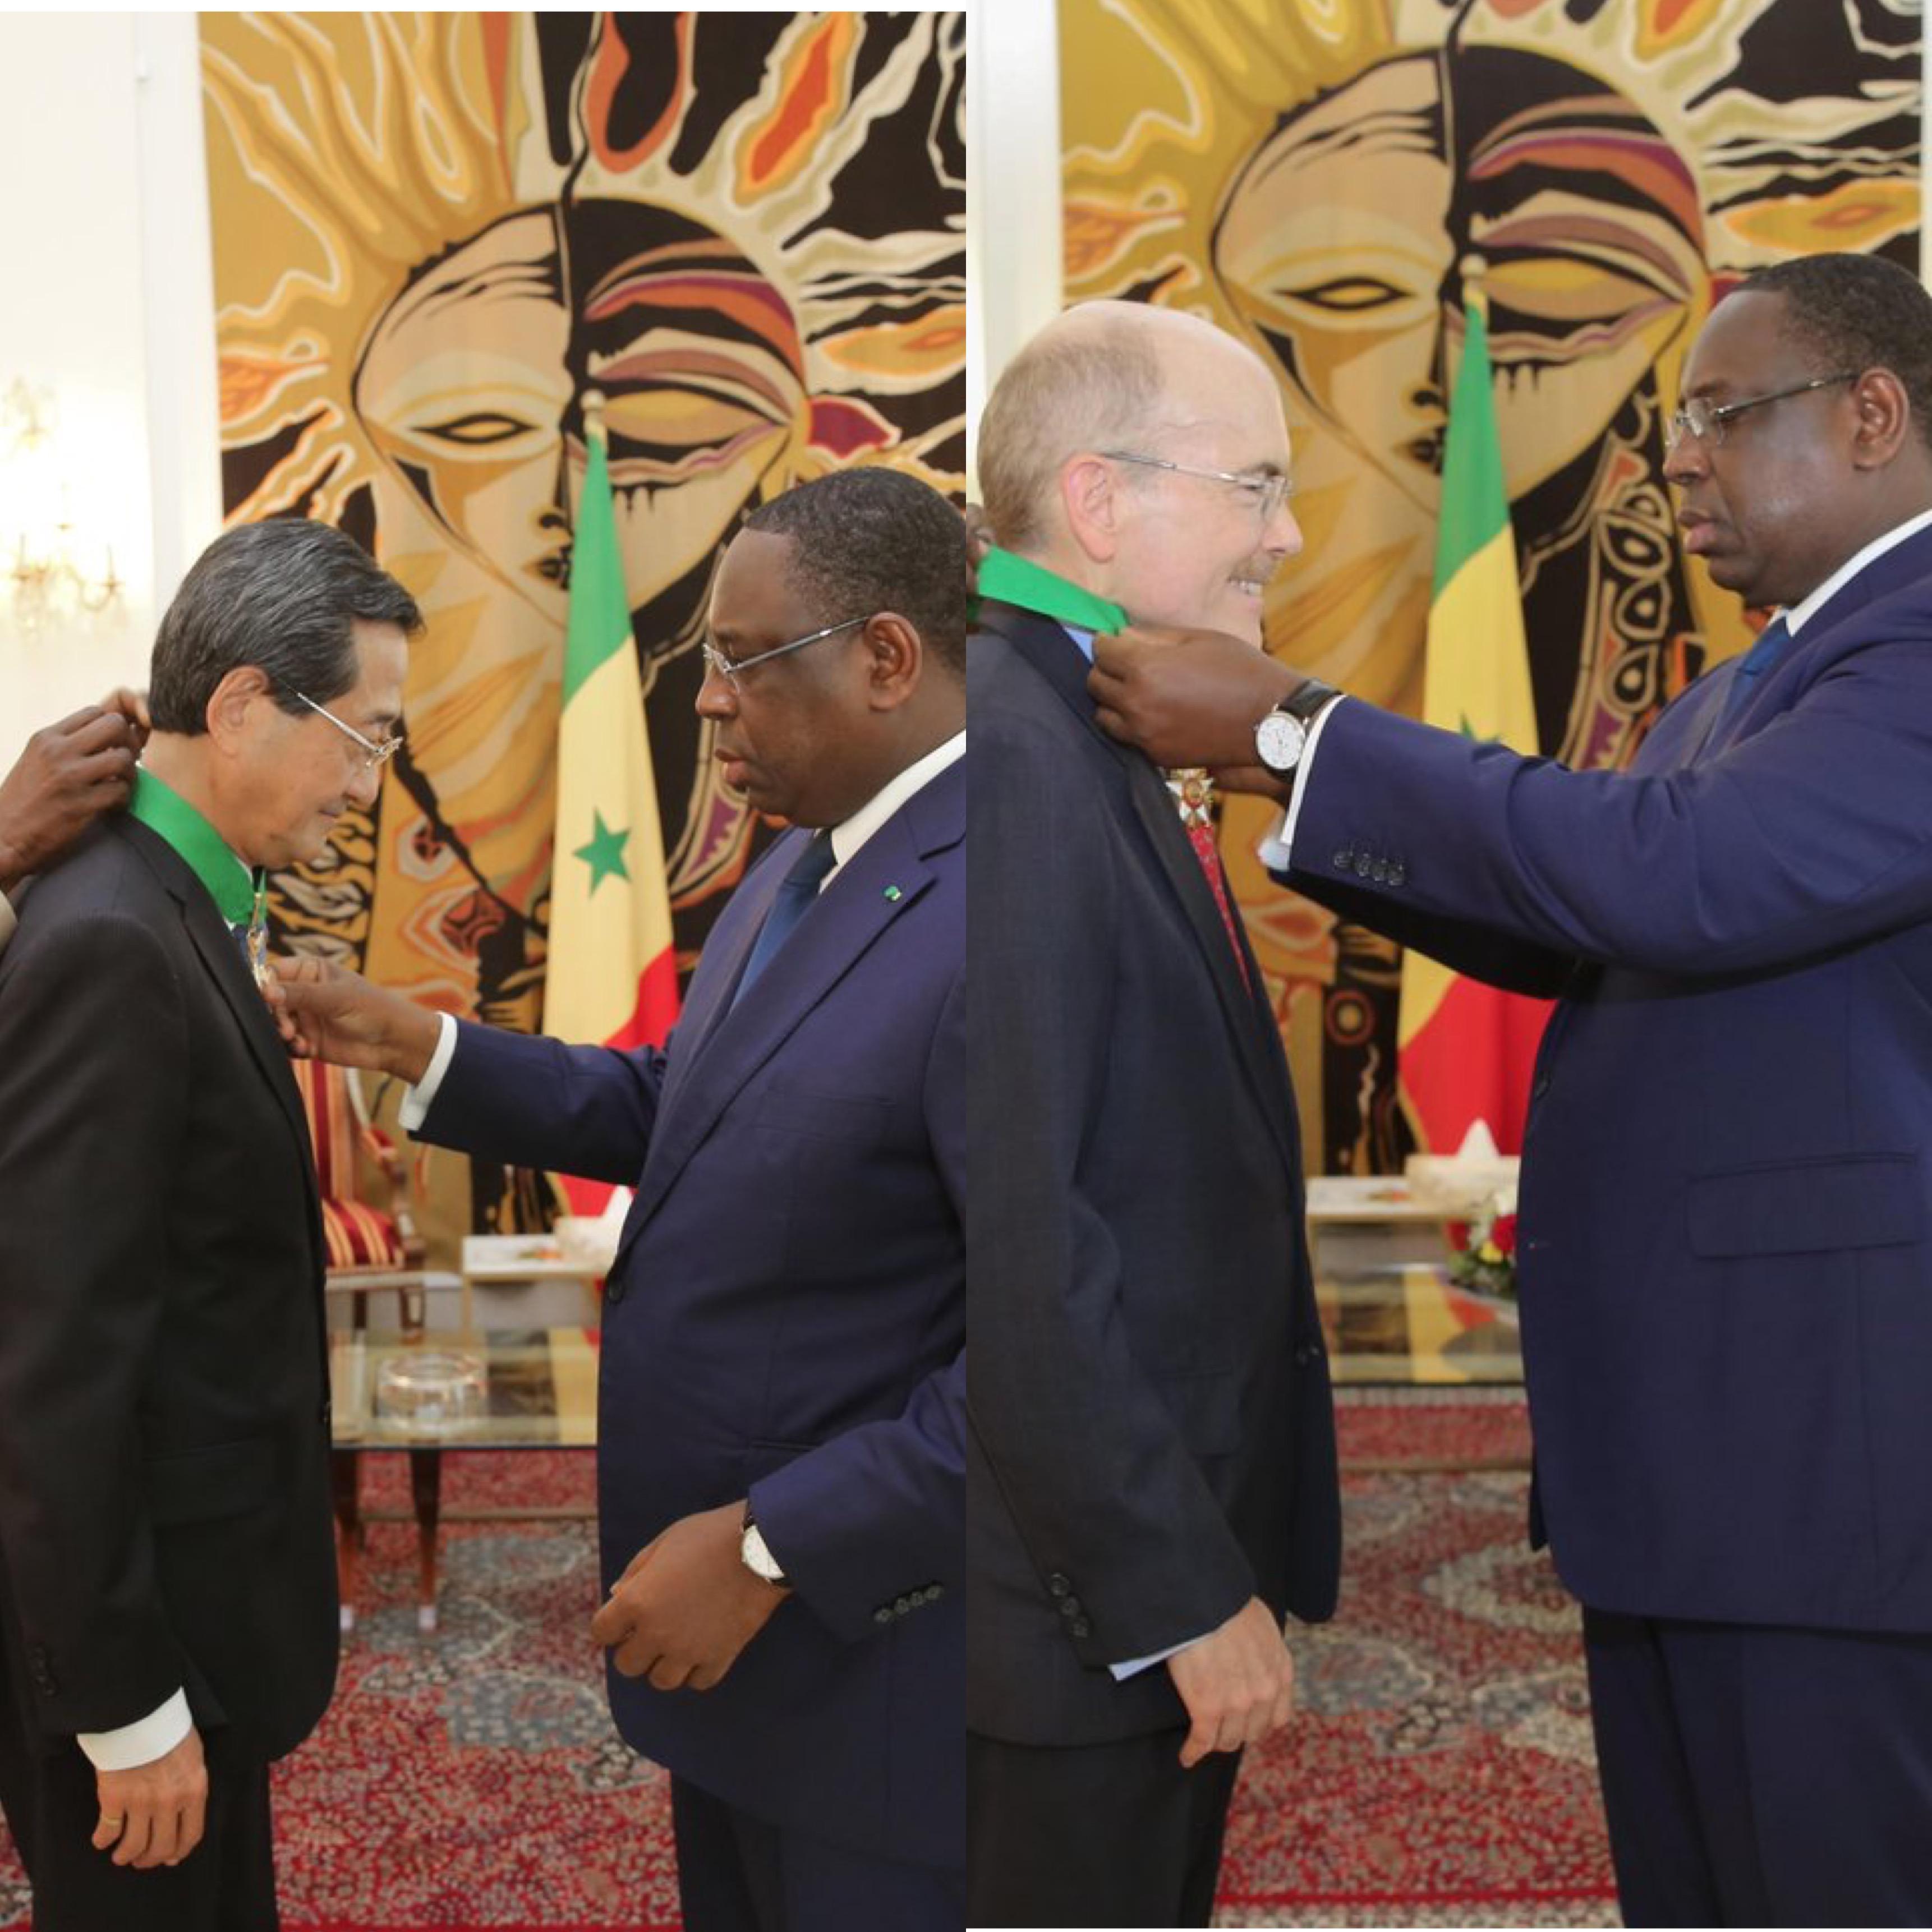 Les ambassadeurs James Zumwalt et Takashi Kitahara élevés dans l'ordre national du Lion